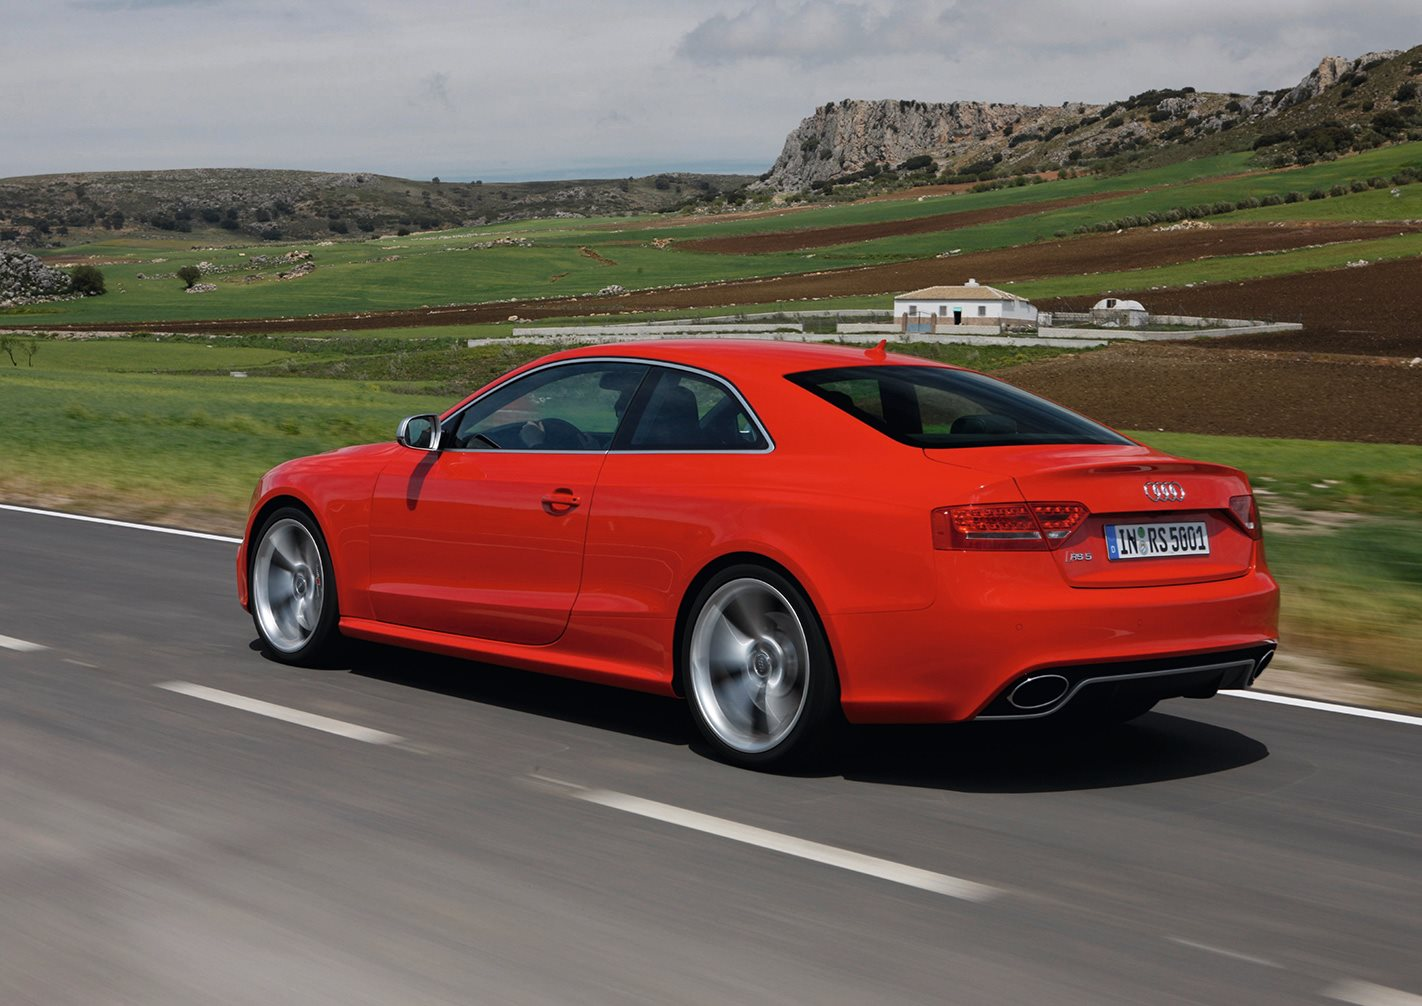 2010 Audi RS5 rear drive